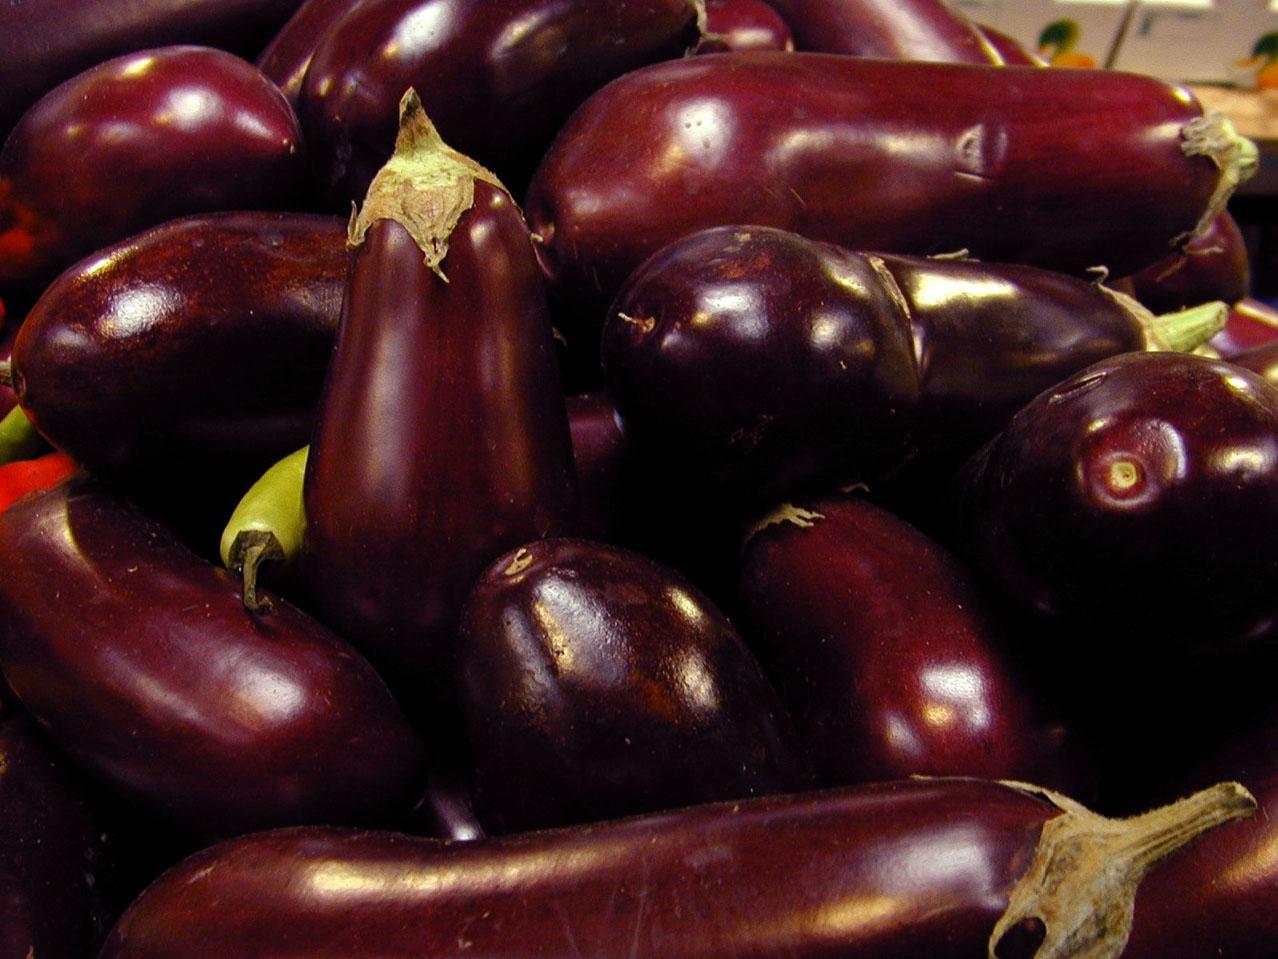 Eggplant is evil!